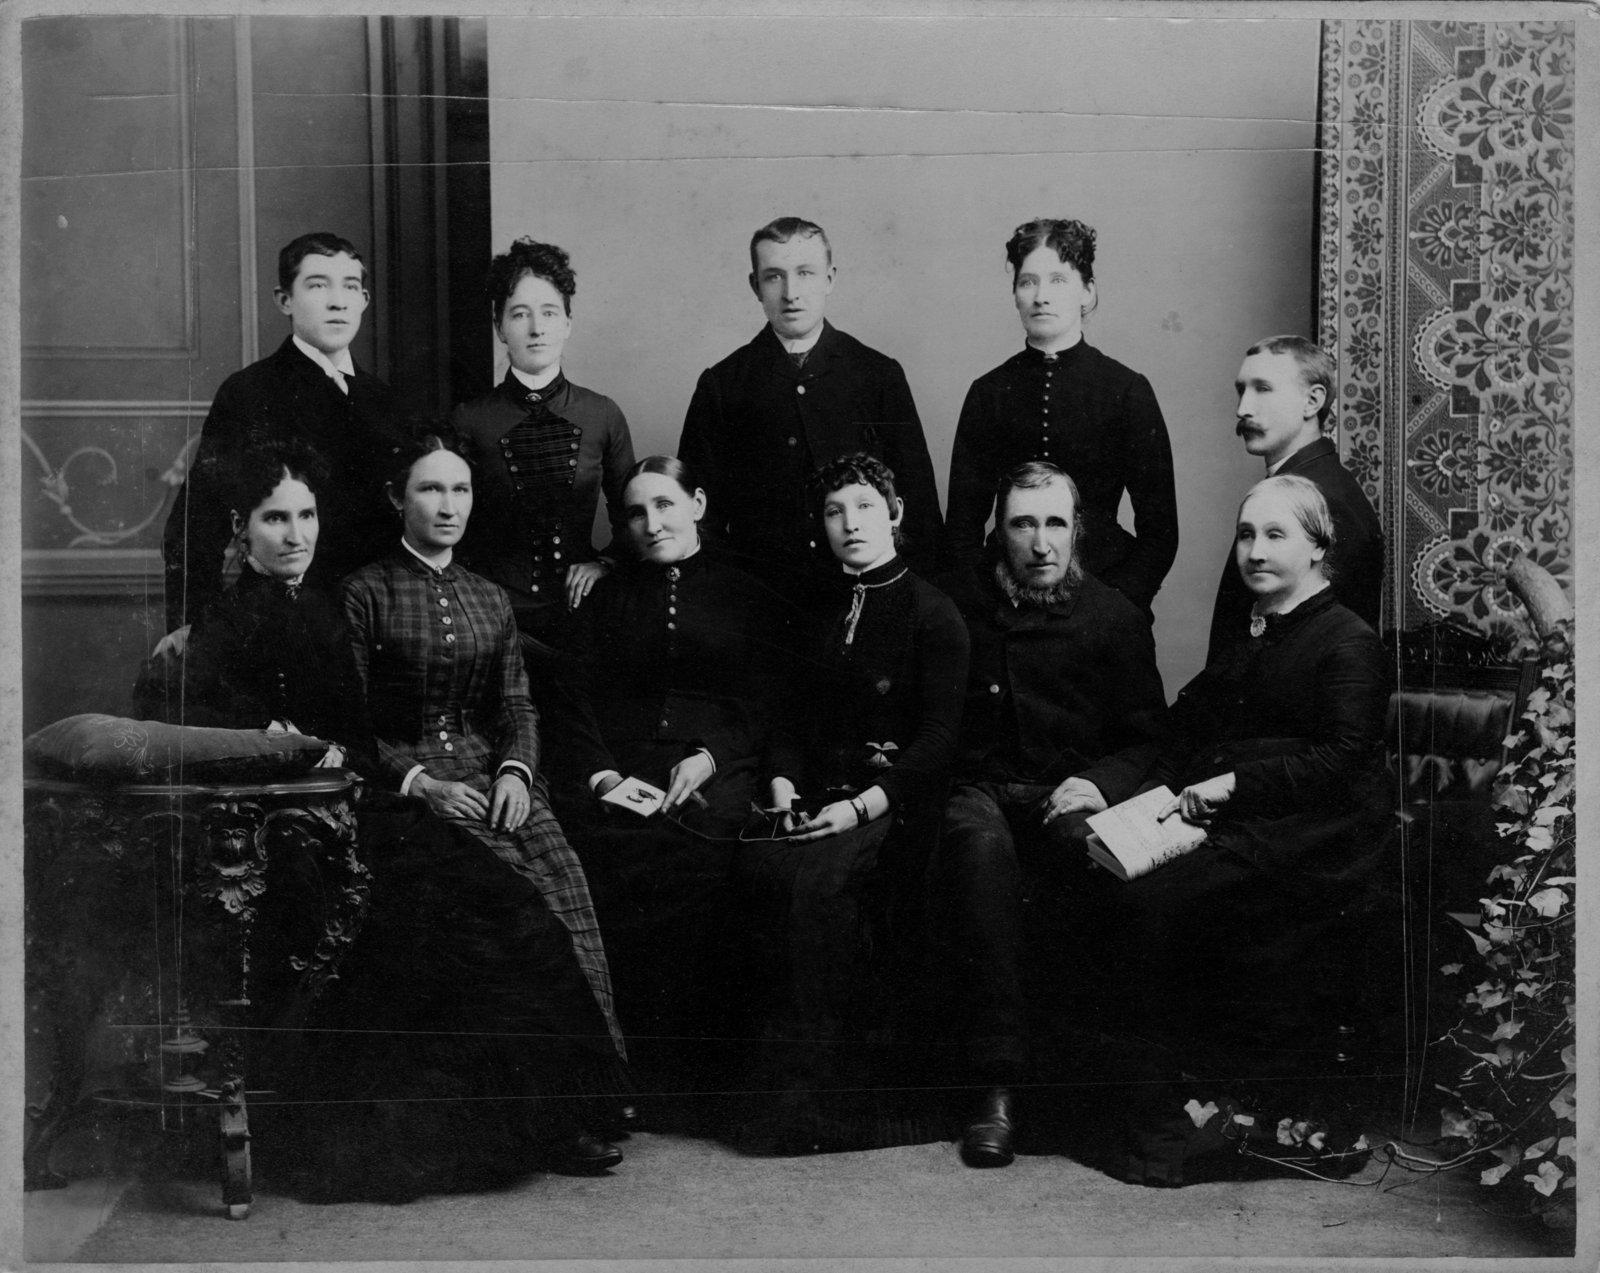 Group portrait of four men and seven women.